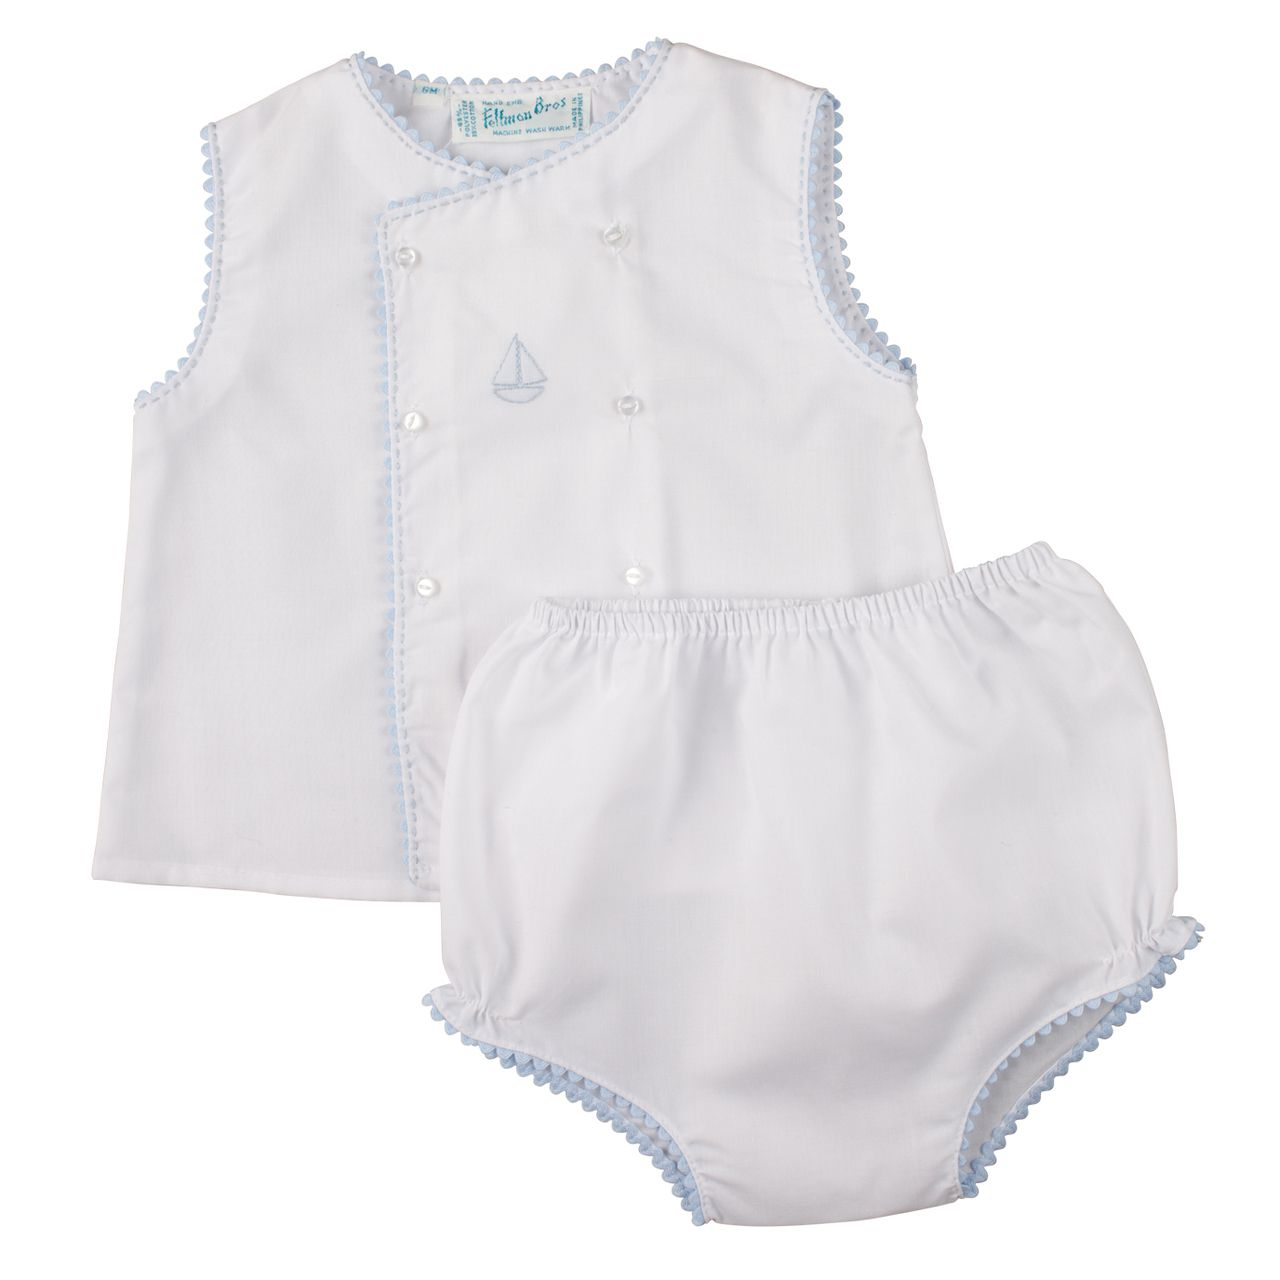 NWT Feltman Brothers Bros White Smocked Baby Bonnet Newborn 0 3 M Boys Cap